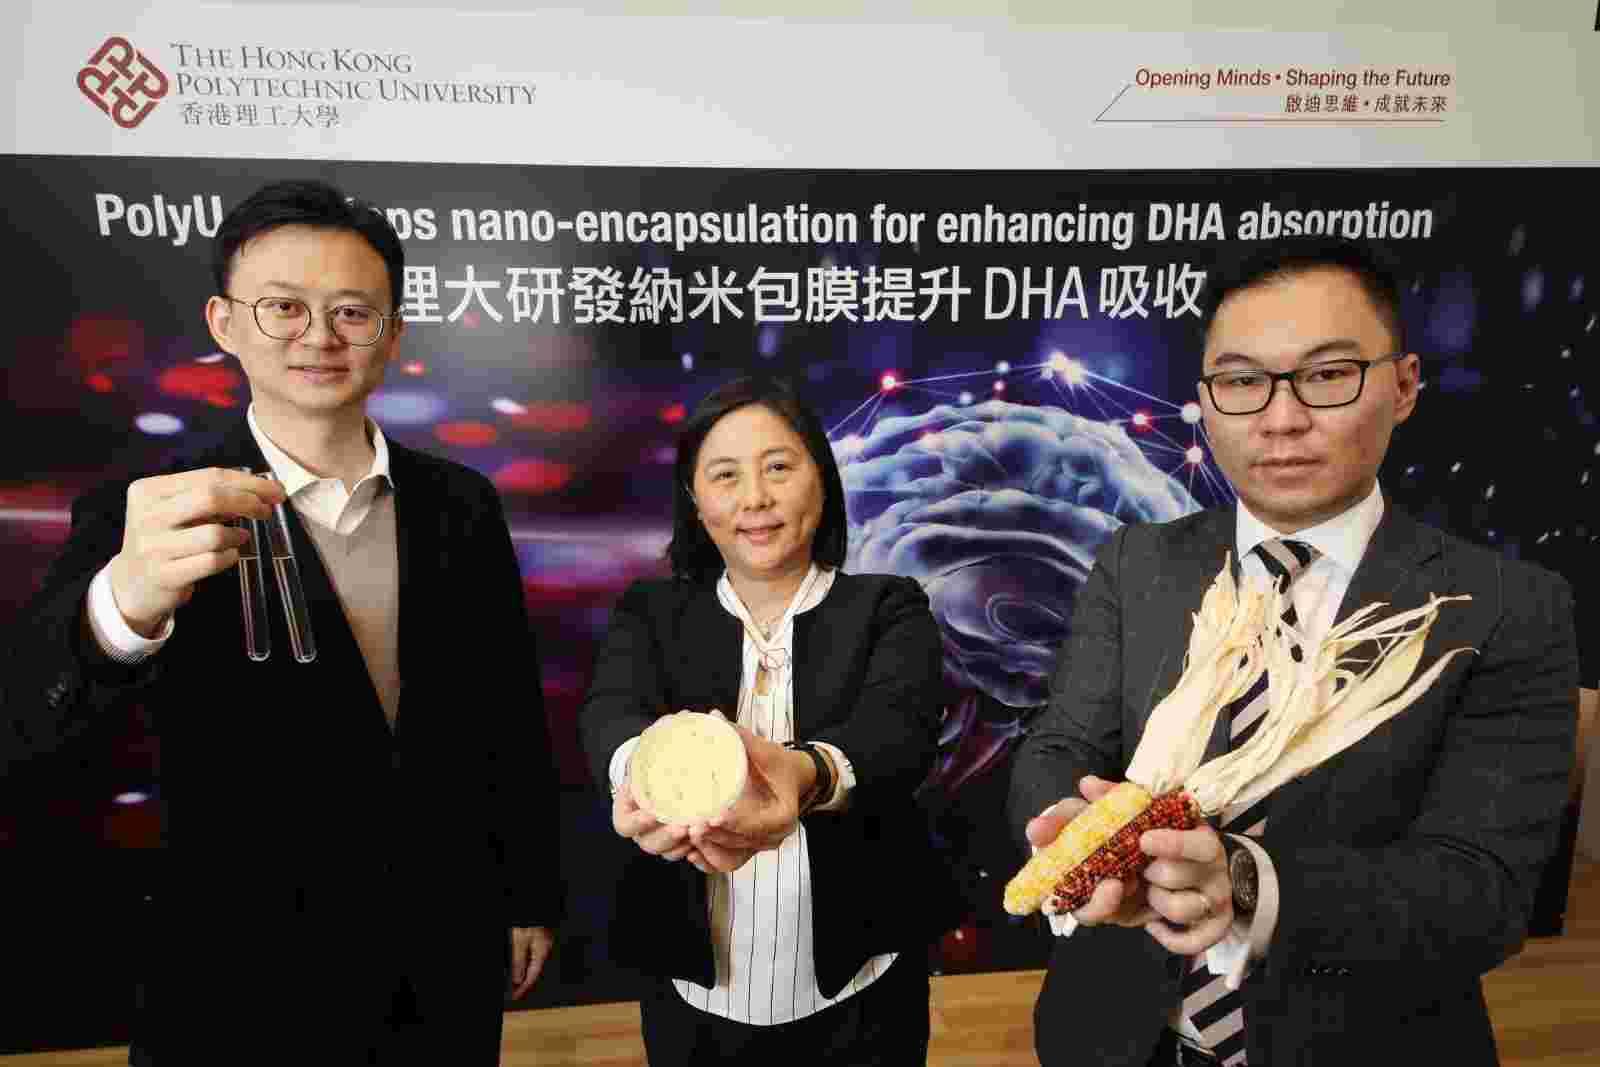 PolyU experts introduce the novel nano-encapsulation technology.